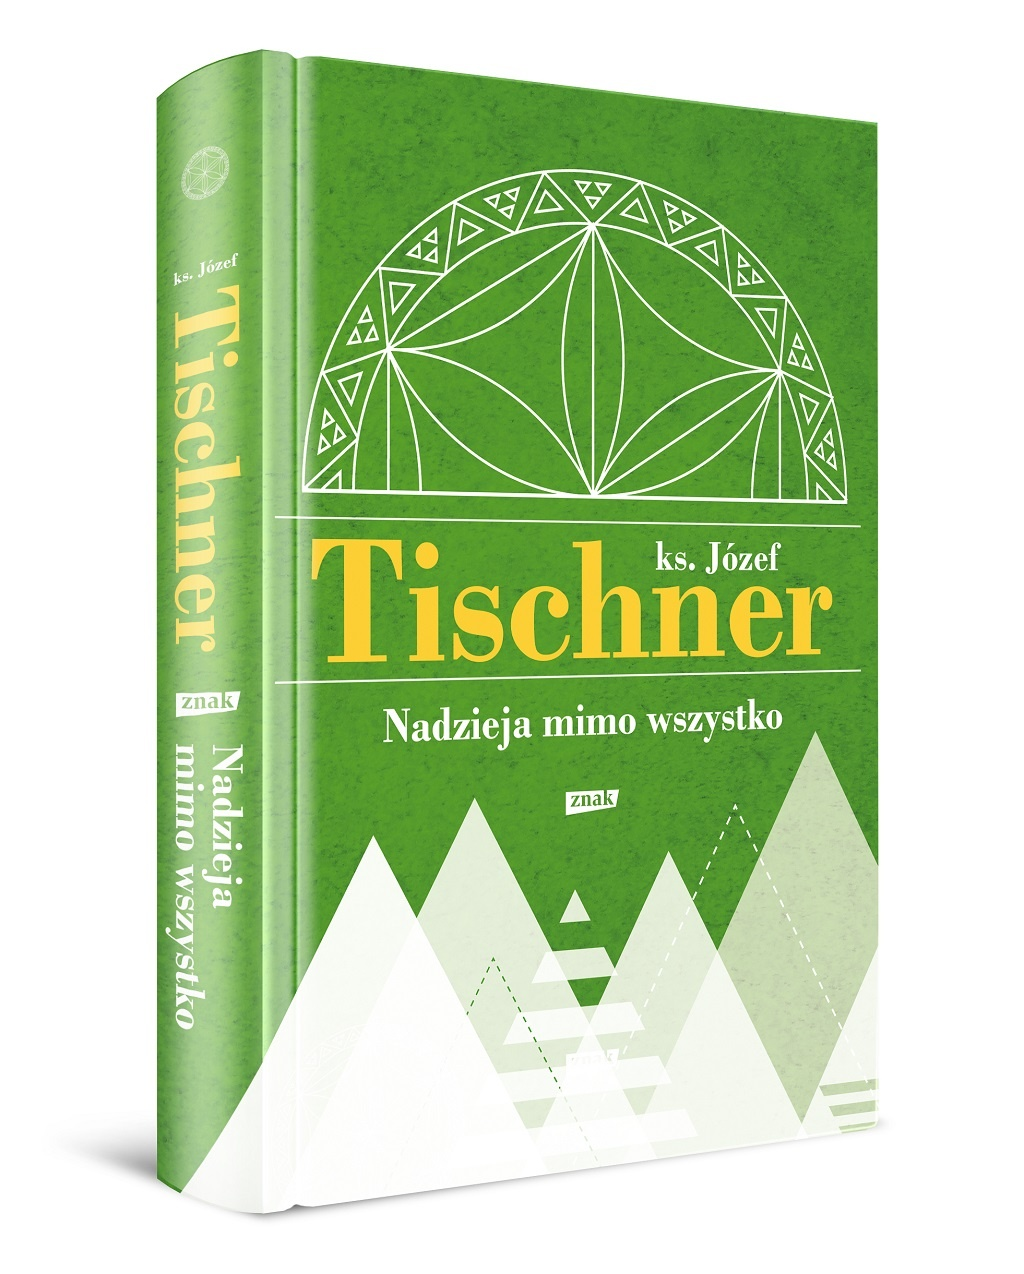 ks. Józef Tischner – Nadzieja mimo wszystko